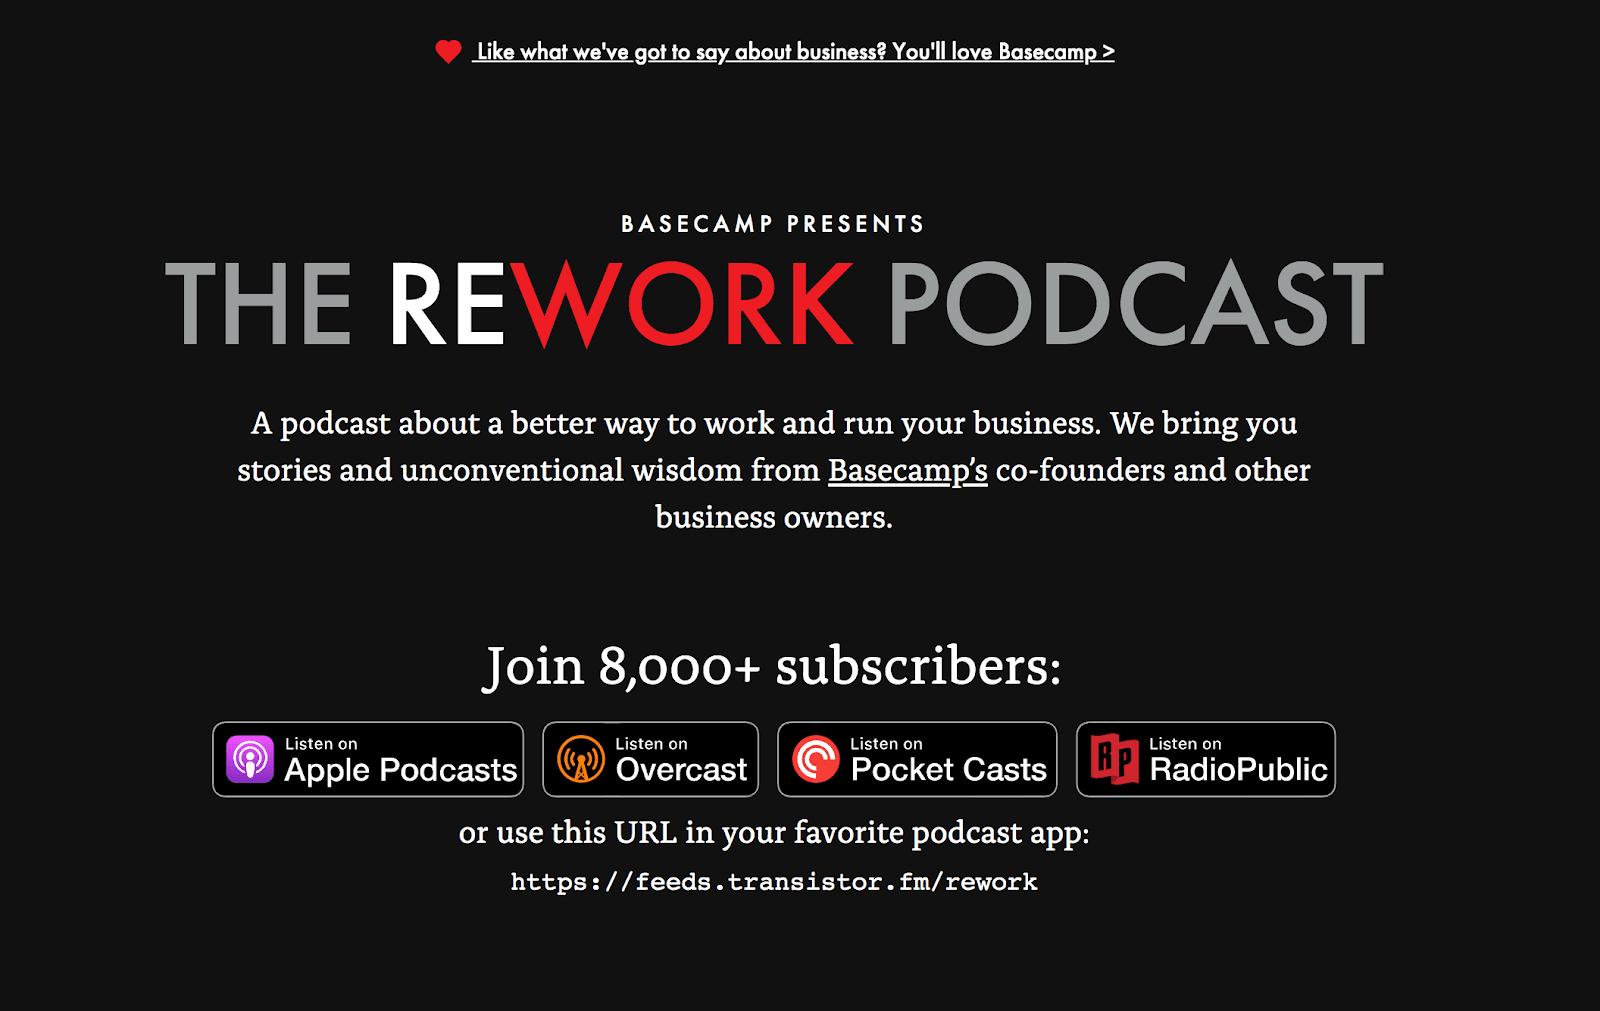 The Rework Podcast